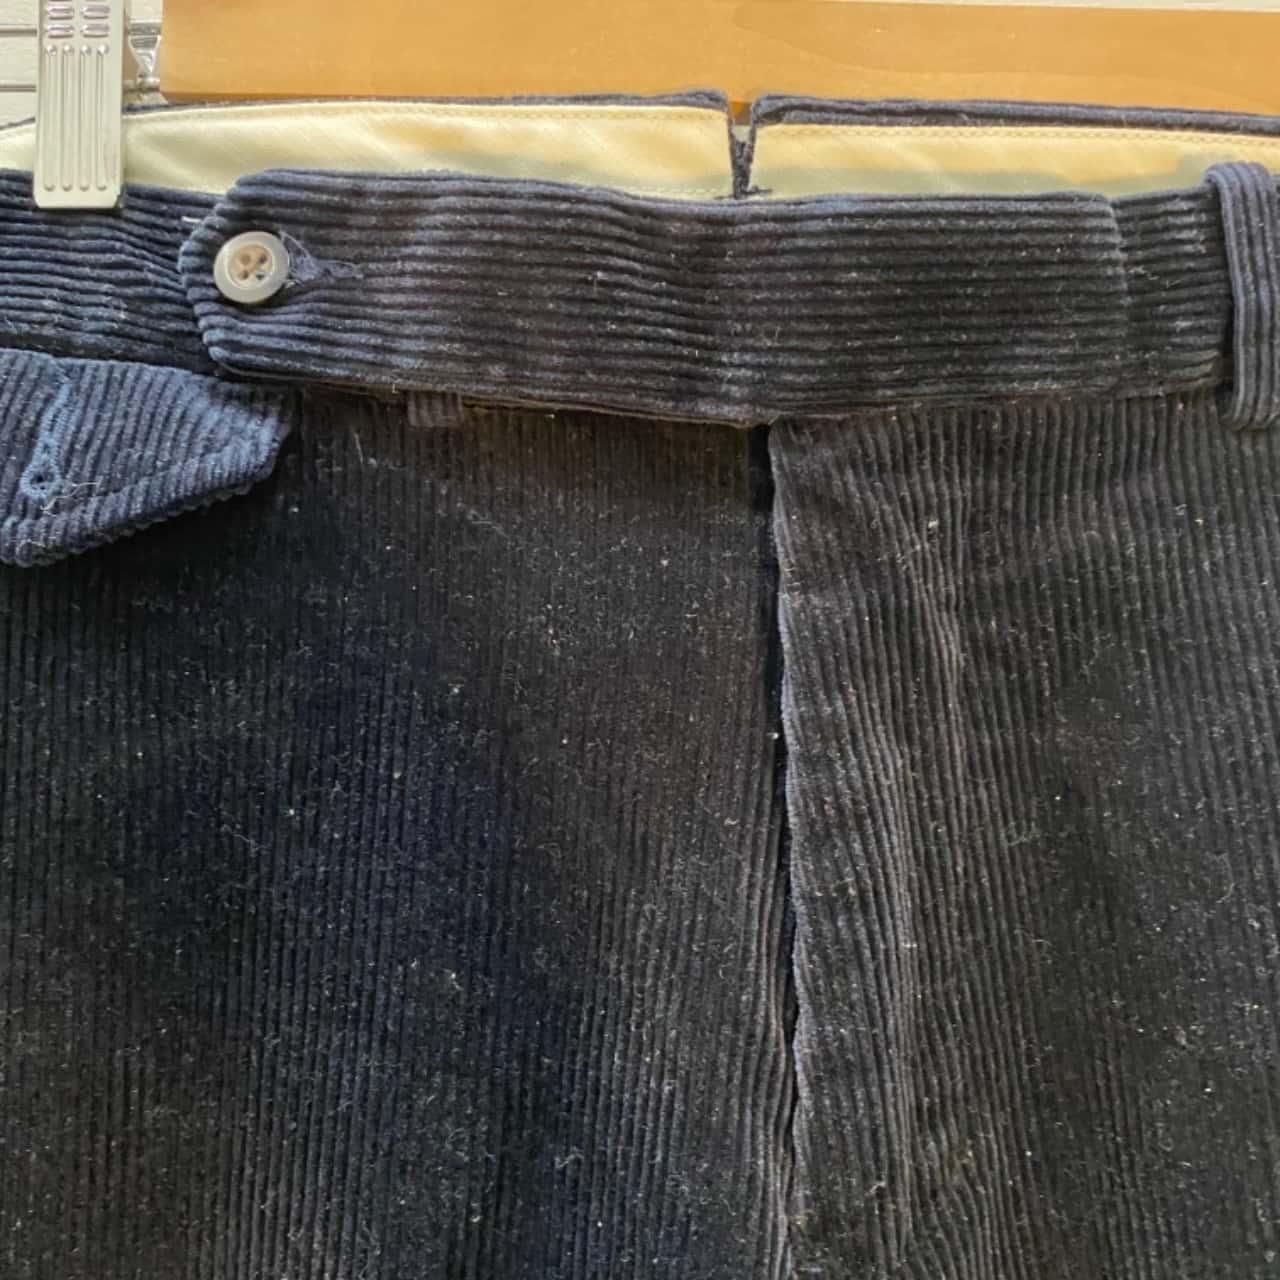 Polo Ralph Lauren Mens Corduroy Chinos Blue  Size34